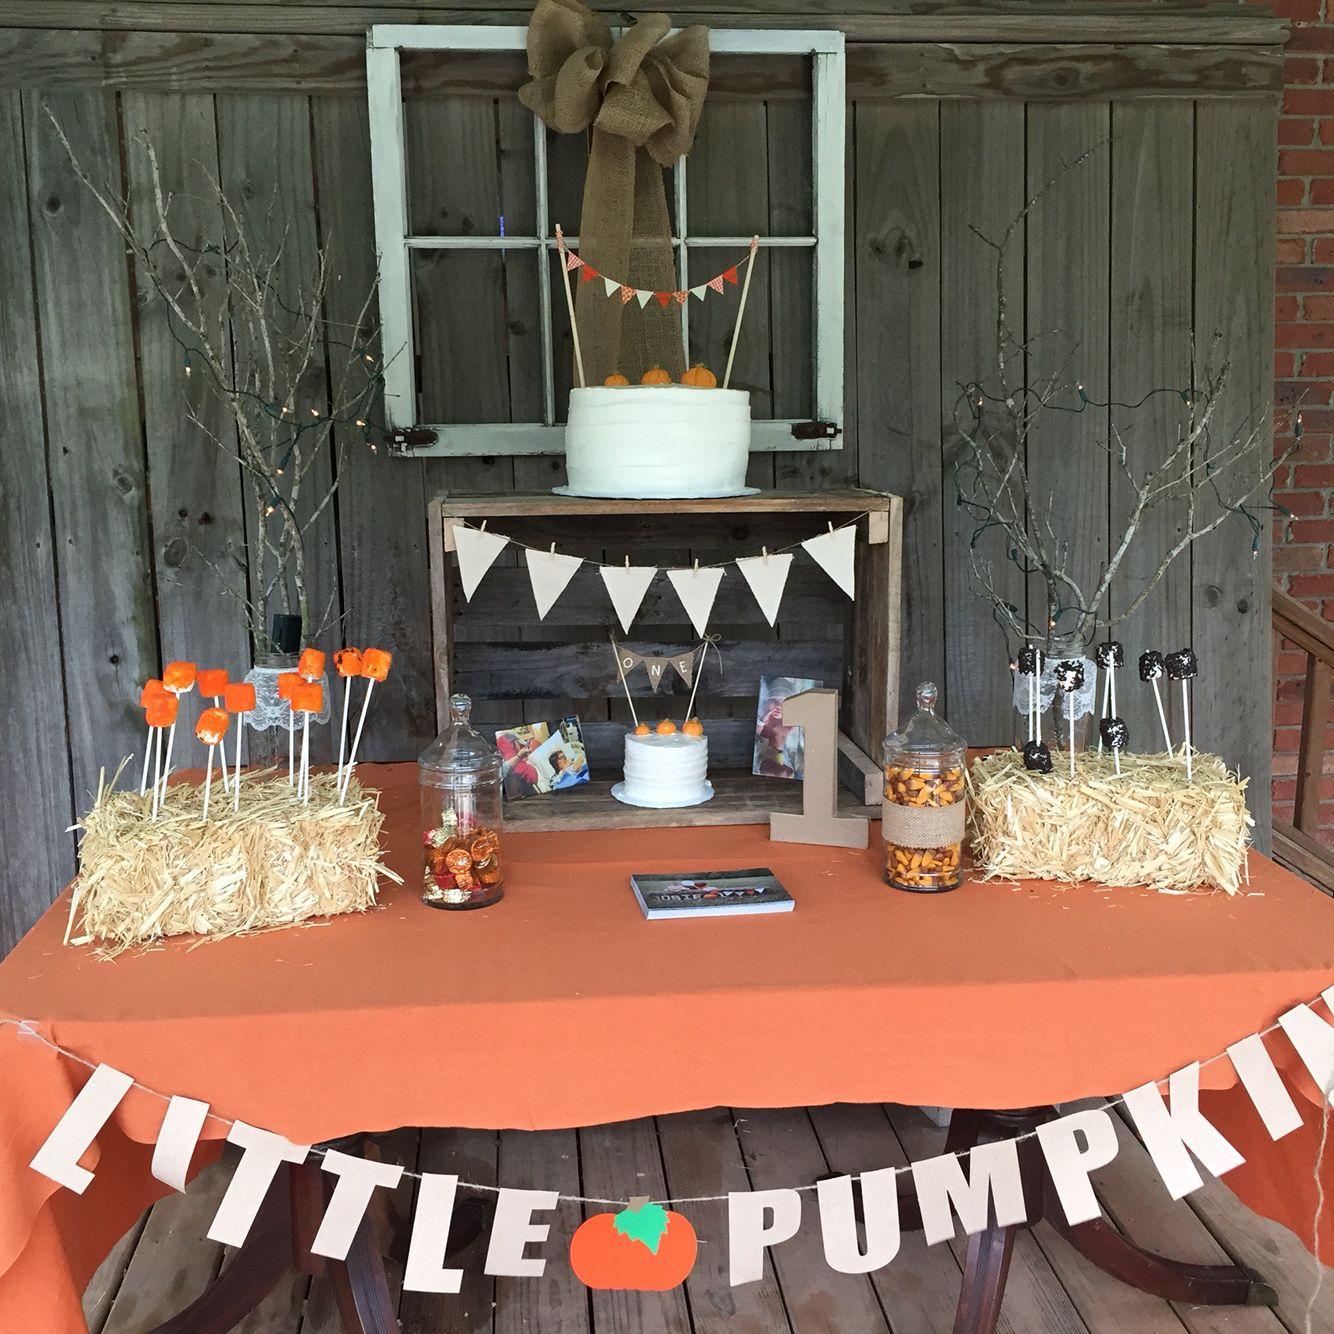 Fall Party Cake Table Pumpkin Party Decorations Pumpkin Birthday Parties Boys First Birthday Party Ideas Pumpkin 1st Birthdays